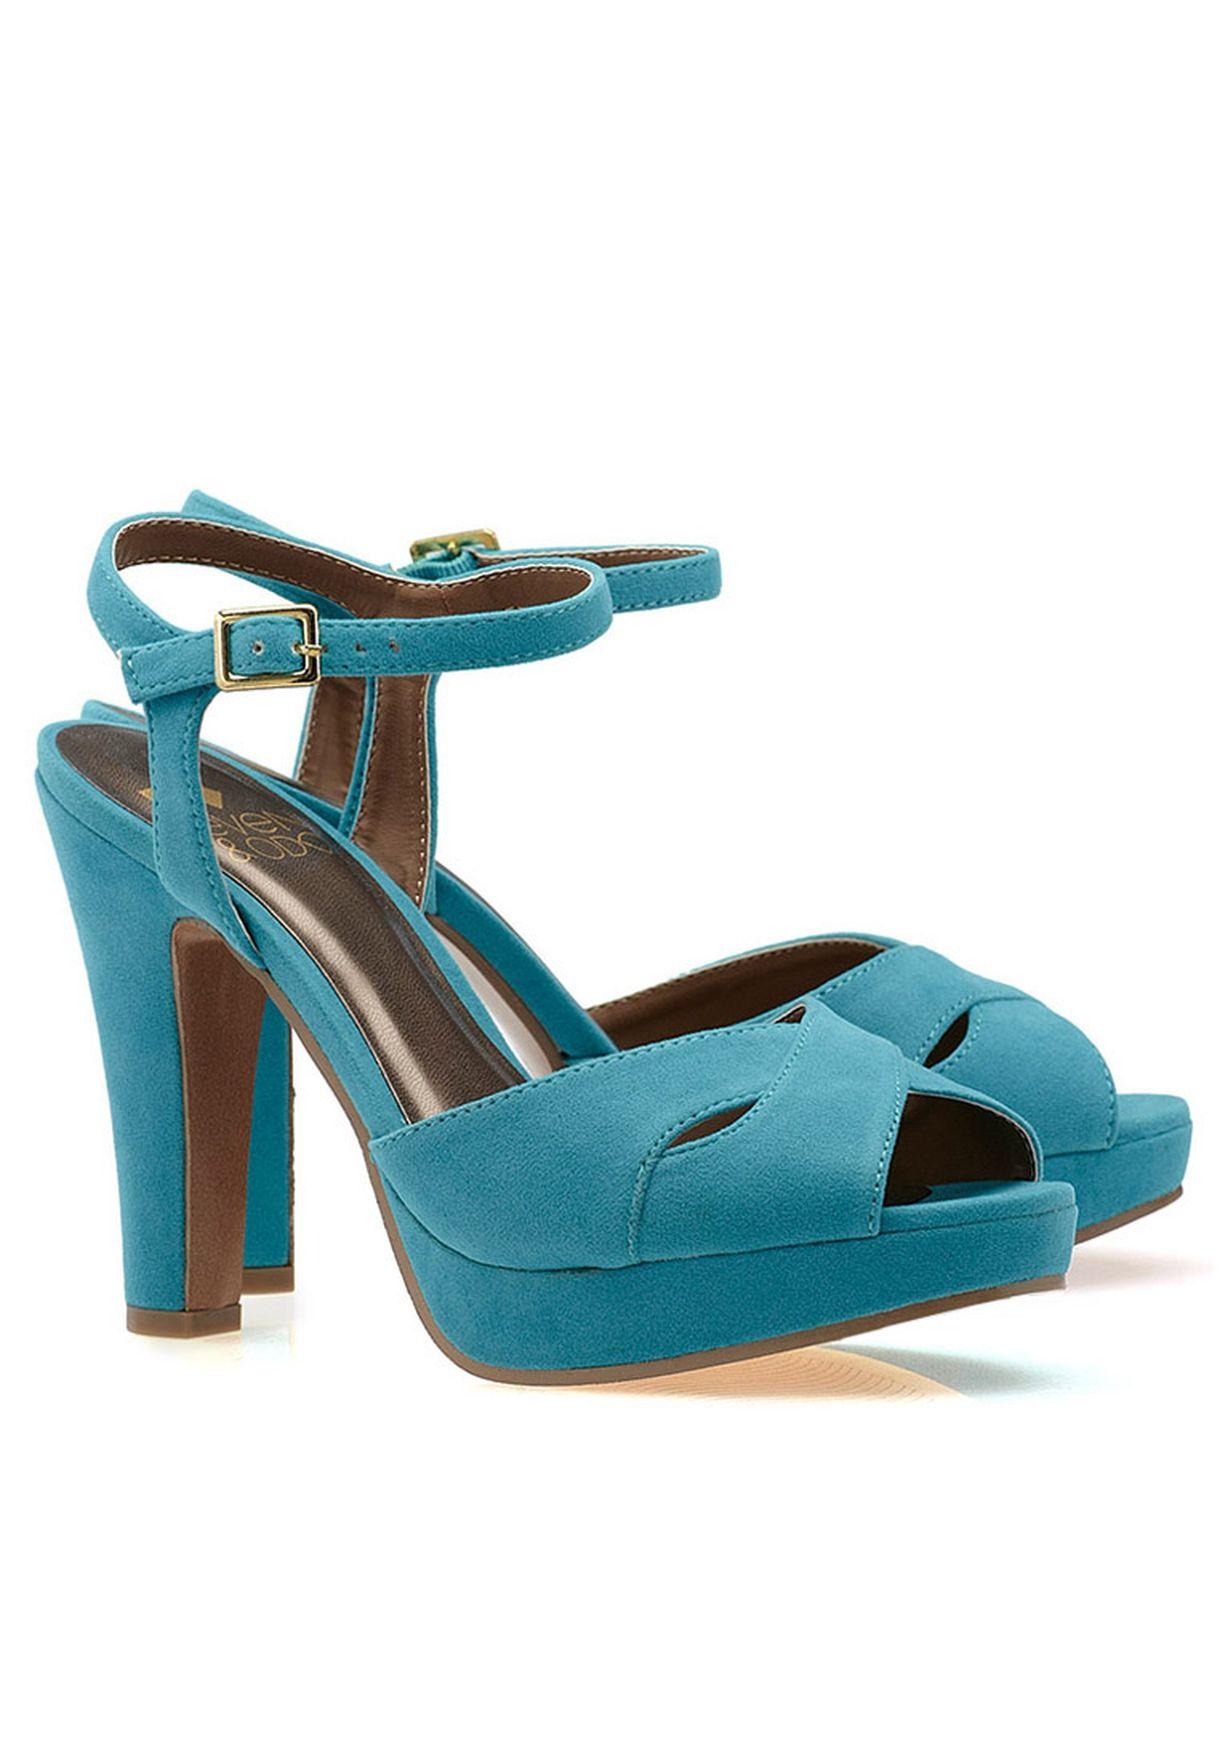 ef7f4199aab Shop Even odd blue Classic High Heel Sandal for Women in Saudi ...